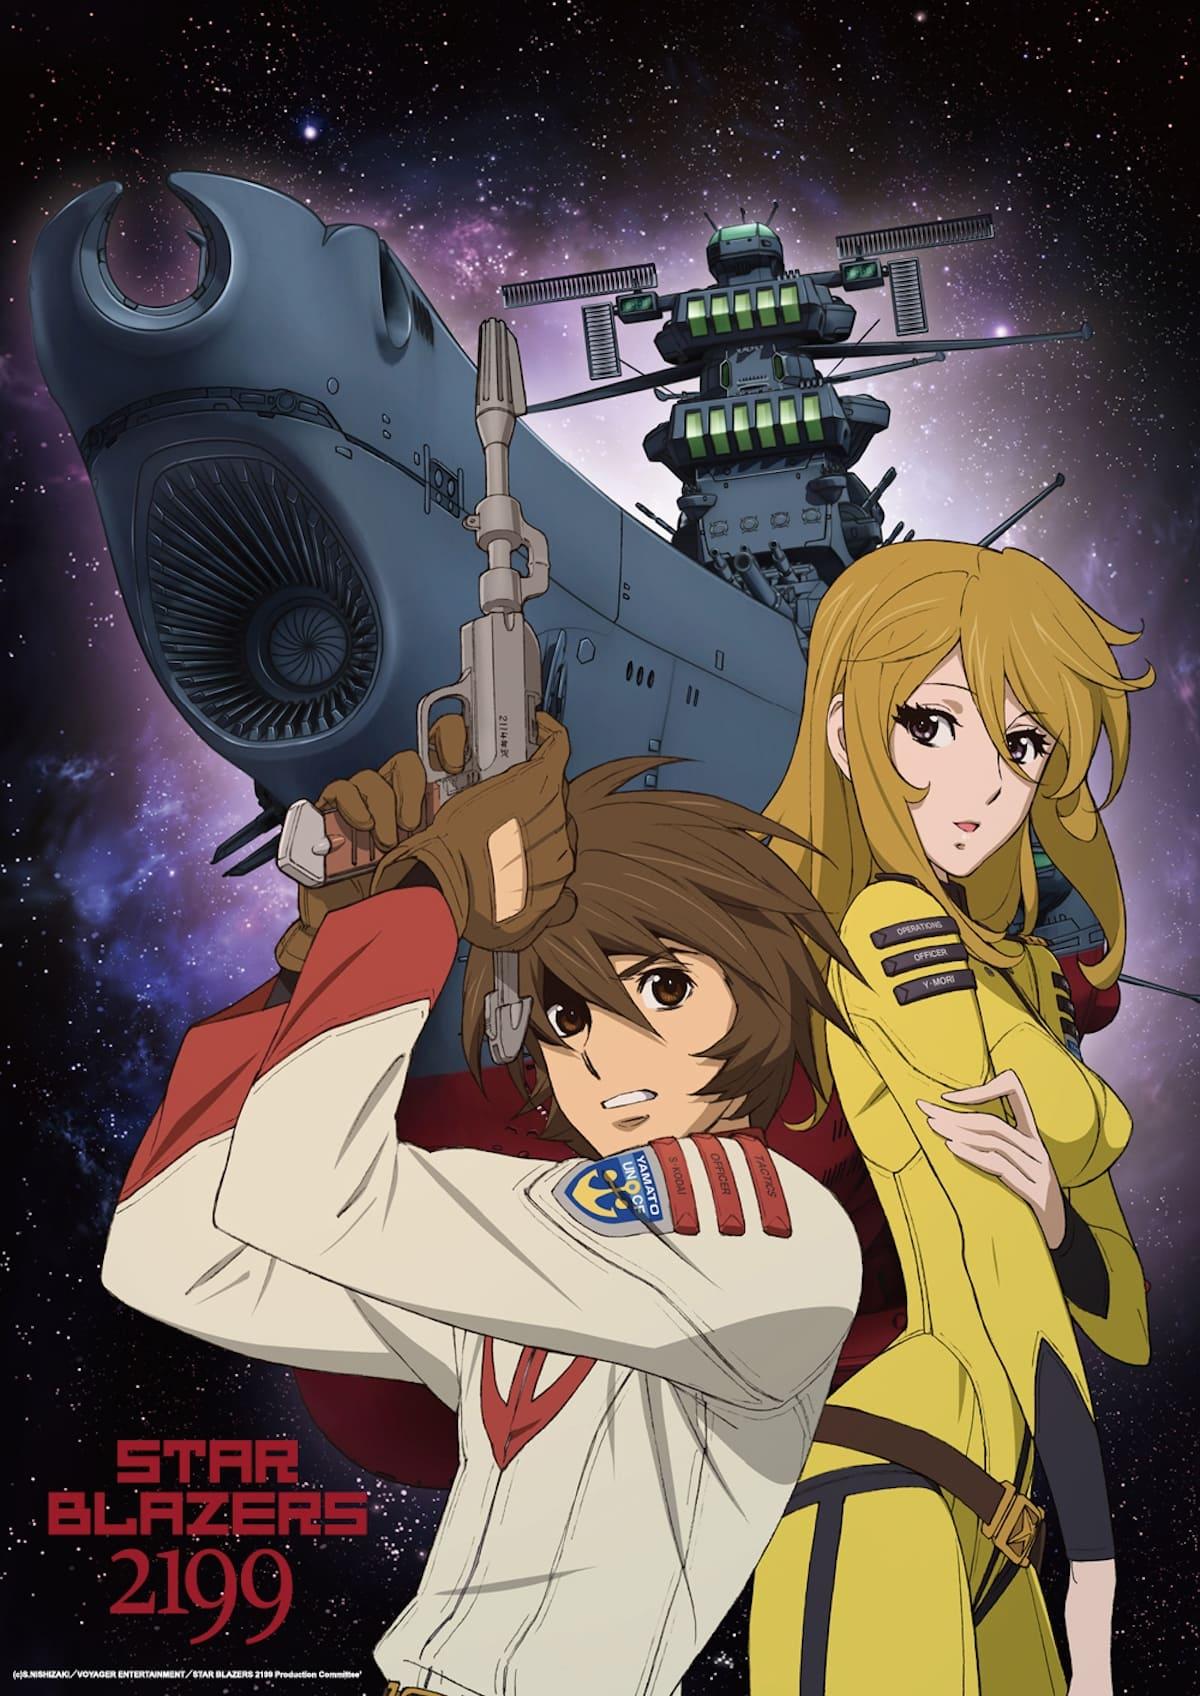 Star Blazers [Space Battleship Yamato] 2199